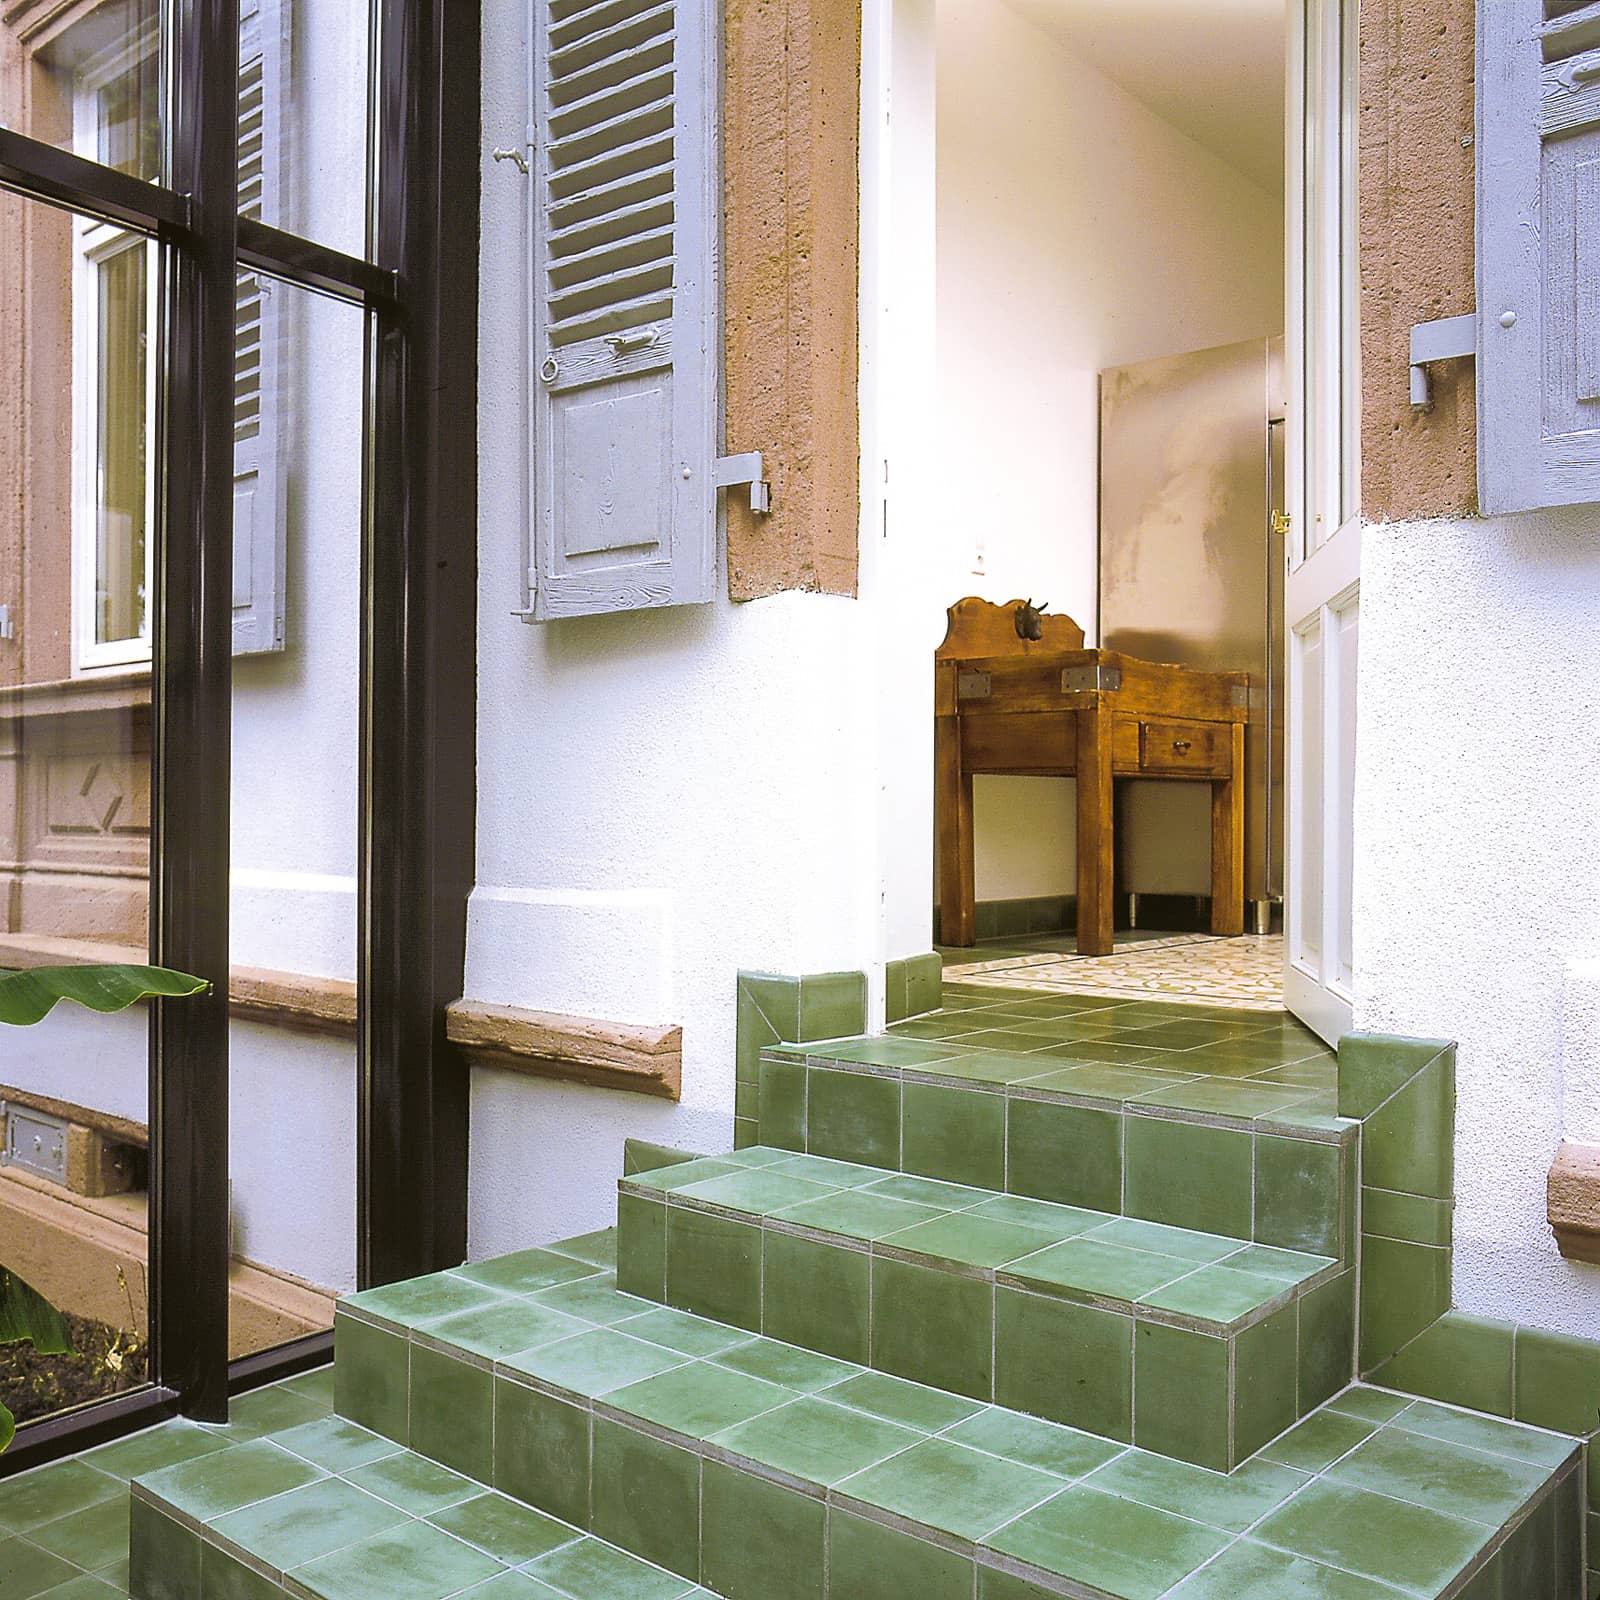 zementfliesen-terrazzofliesen-kreidefarbe-terrazzo-fugenlos-viaplatten-22-treppe | 22